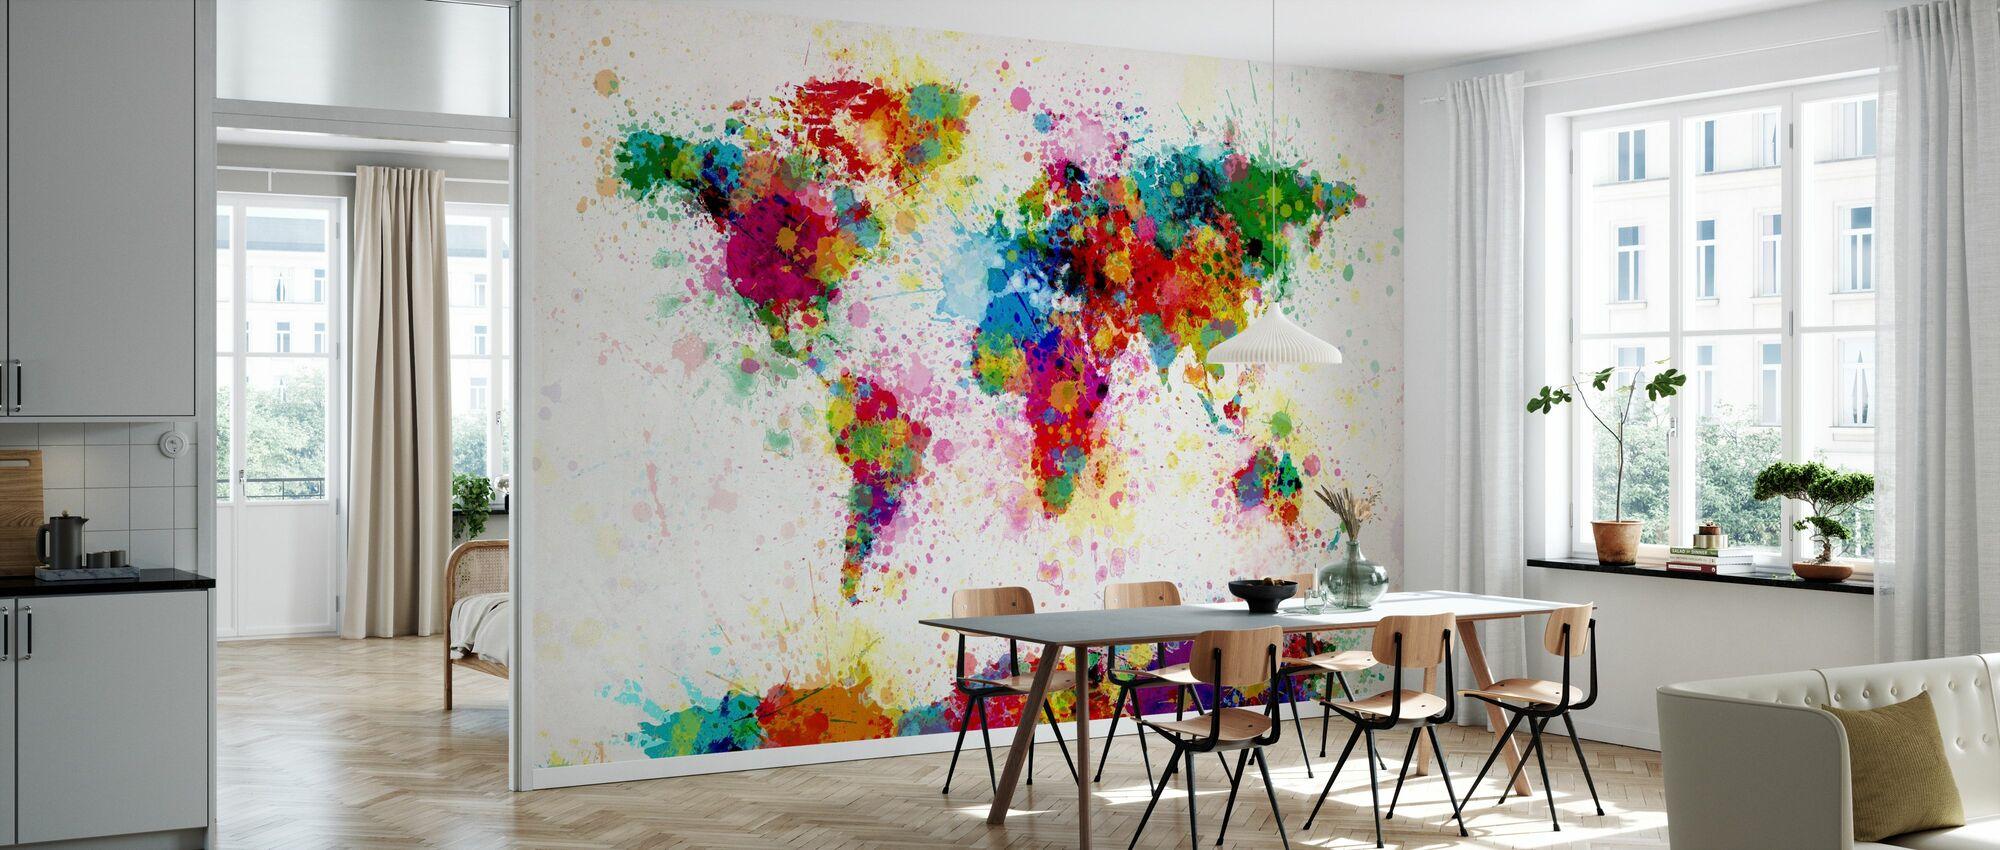 Paint Splashes Karte - Tapete - Küchen